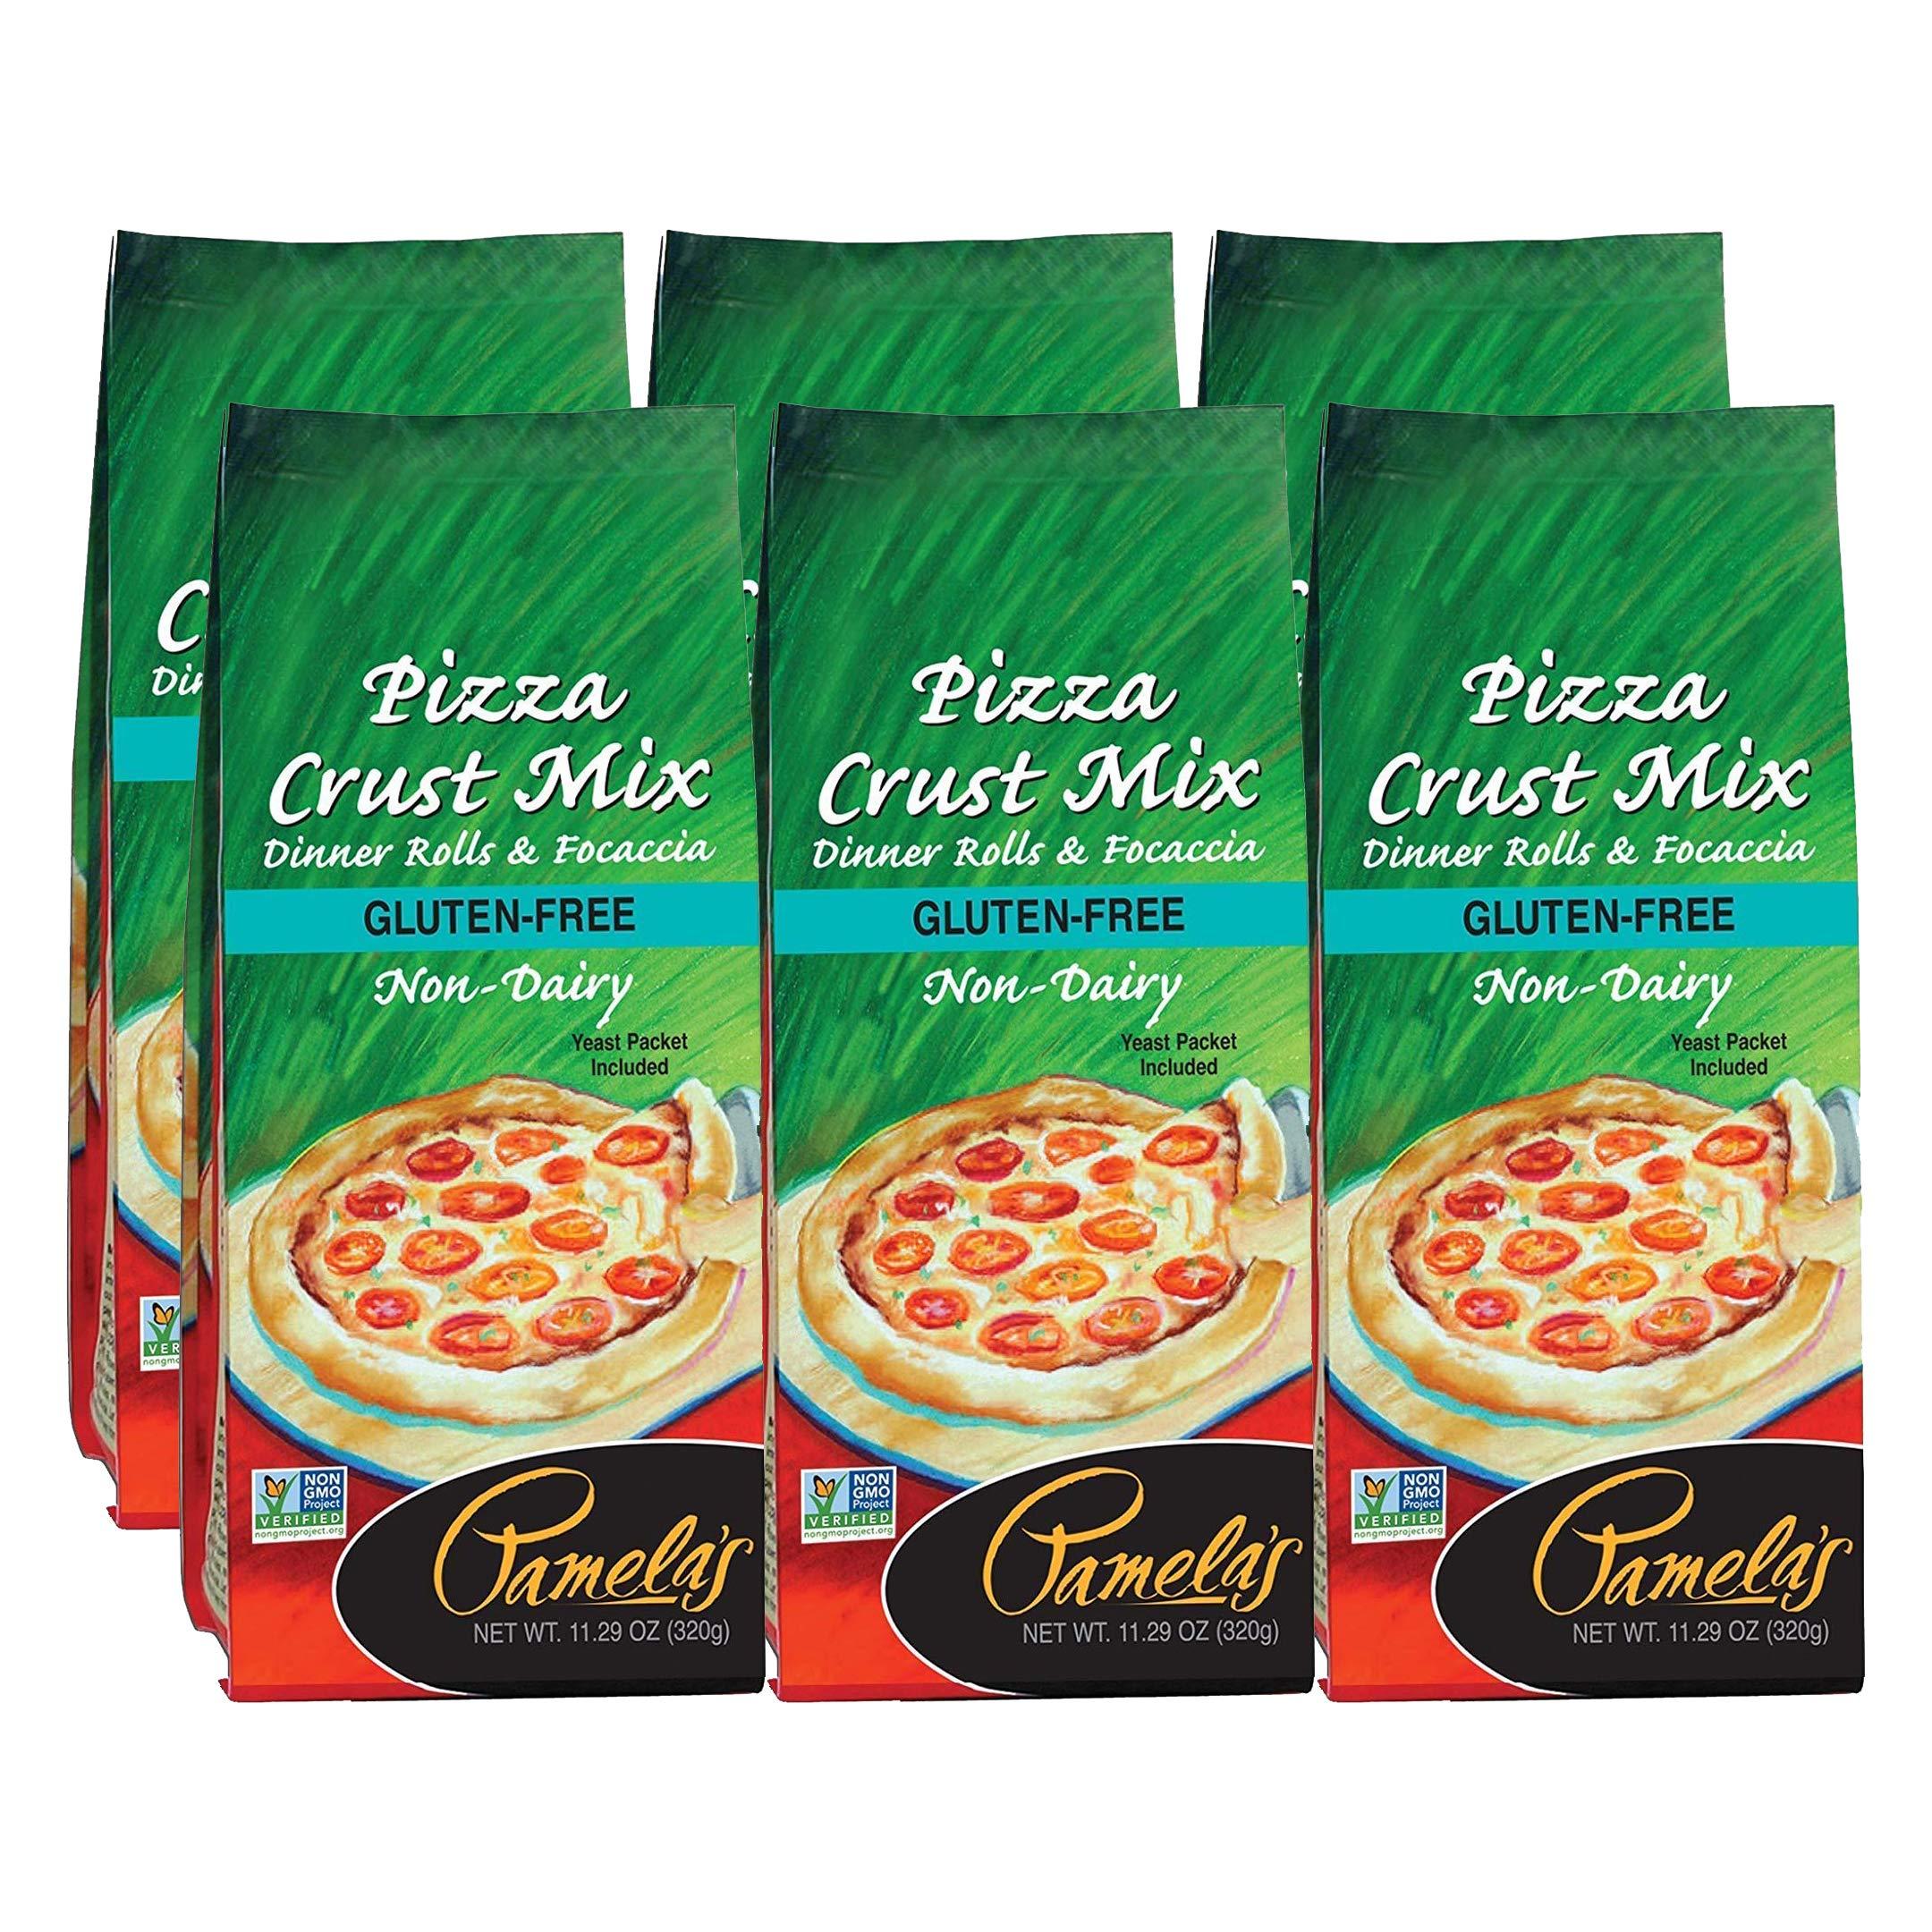 Pamelas Gluten Free Pizza Crust Mix, 11.29 OZ (Pack - 6) by Pamela's Products